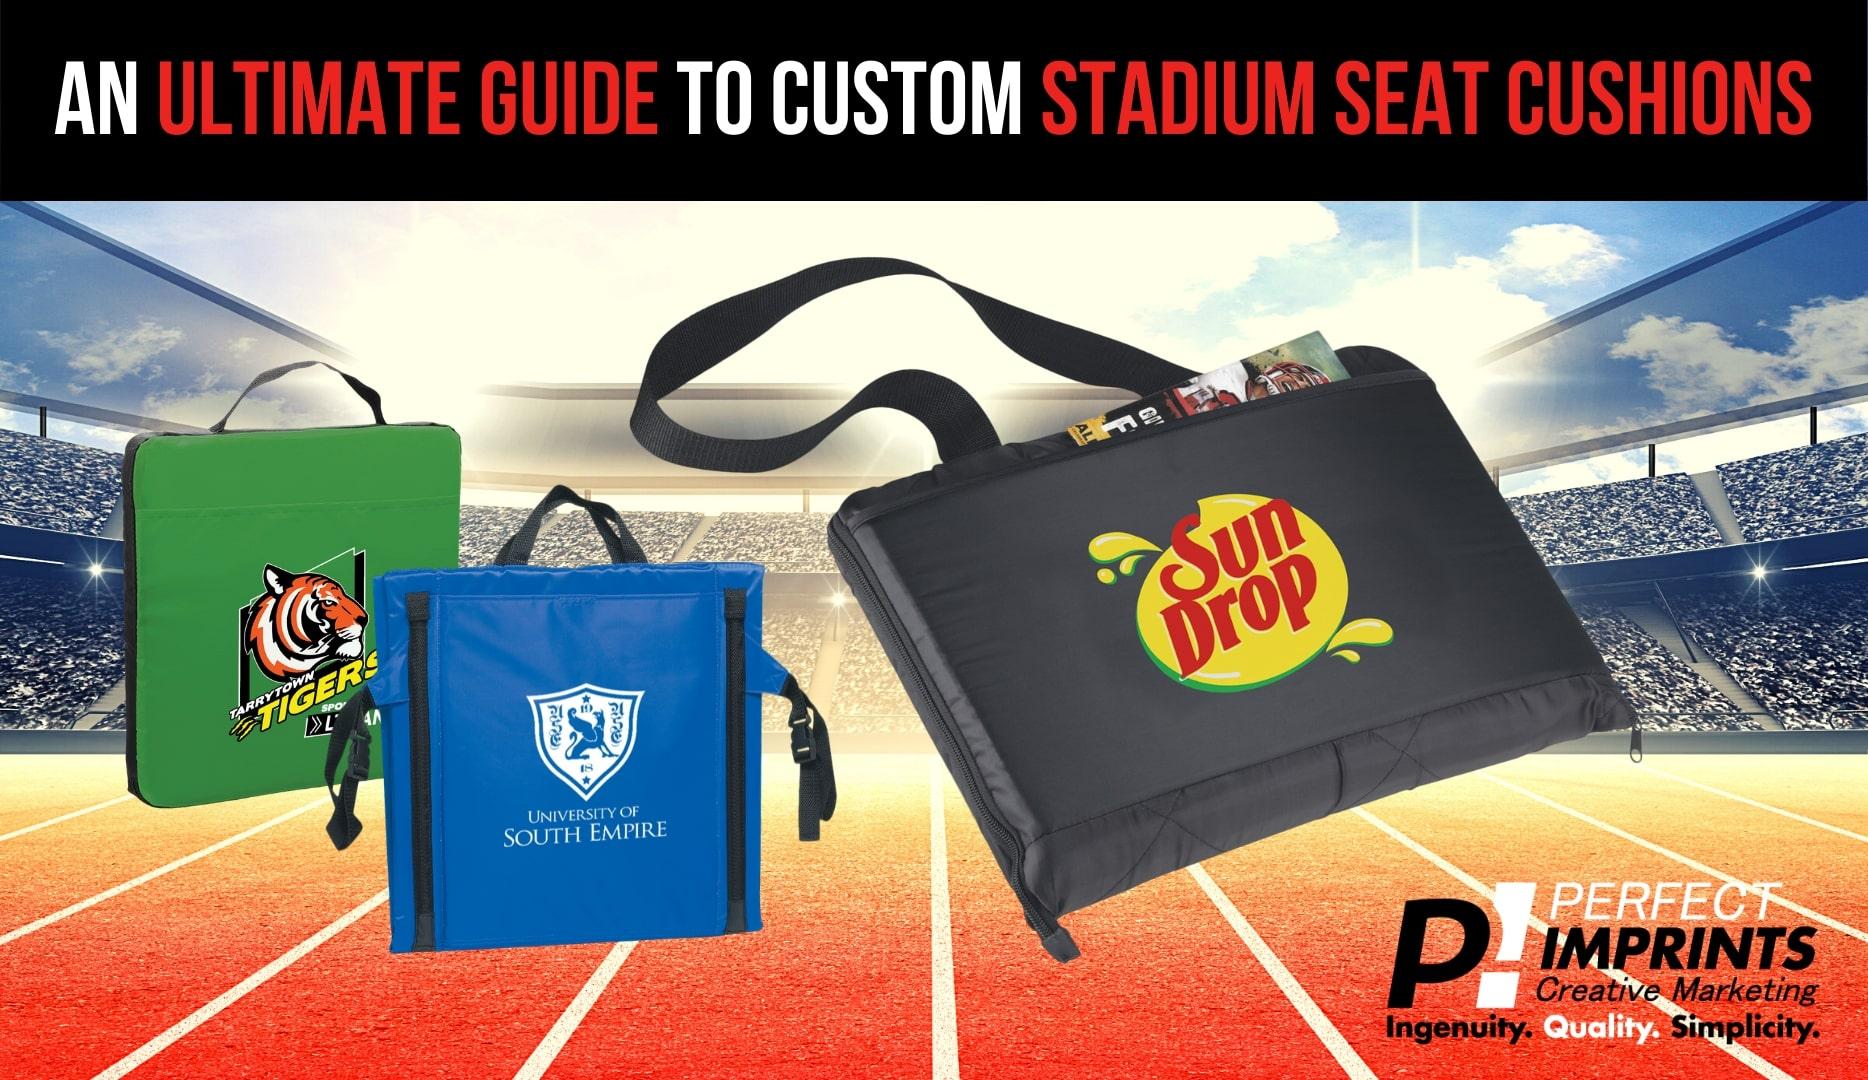 A Guide To Custom Stadium Seat Cushions